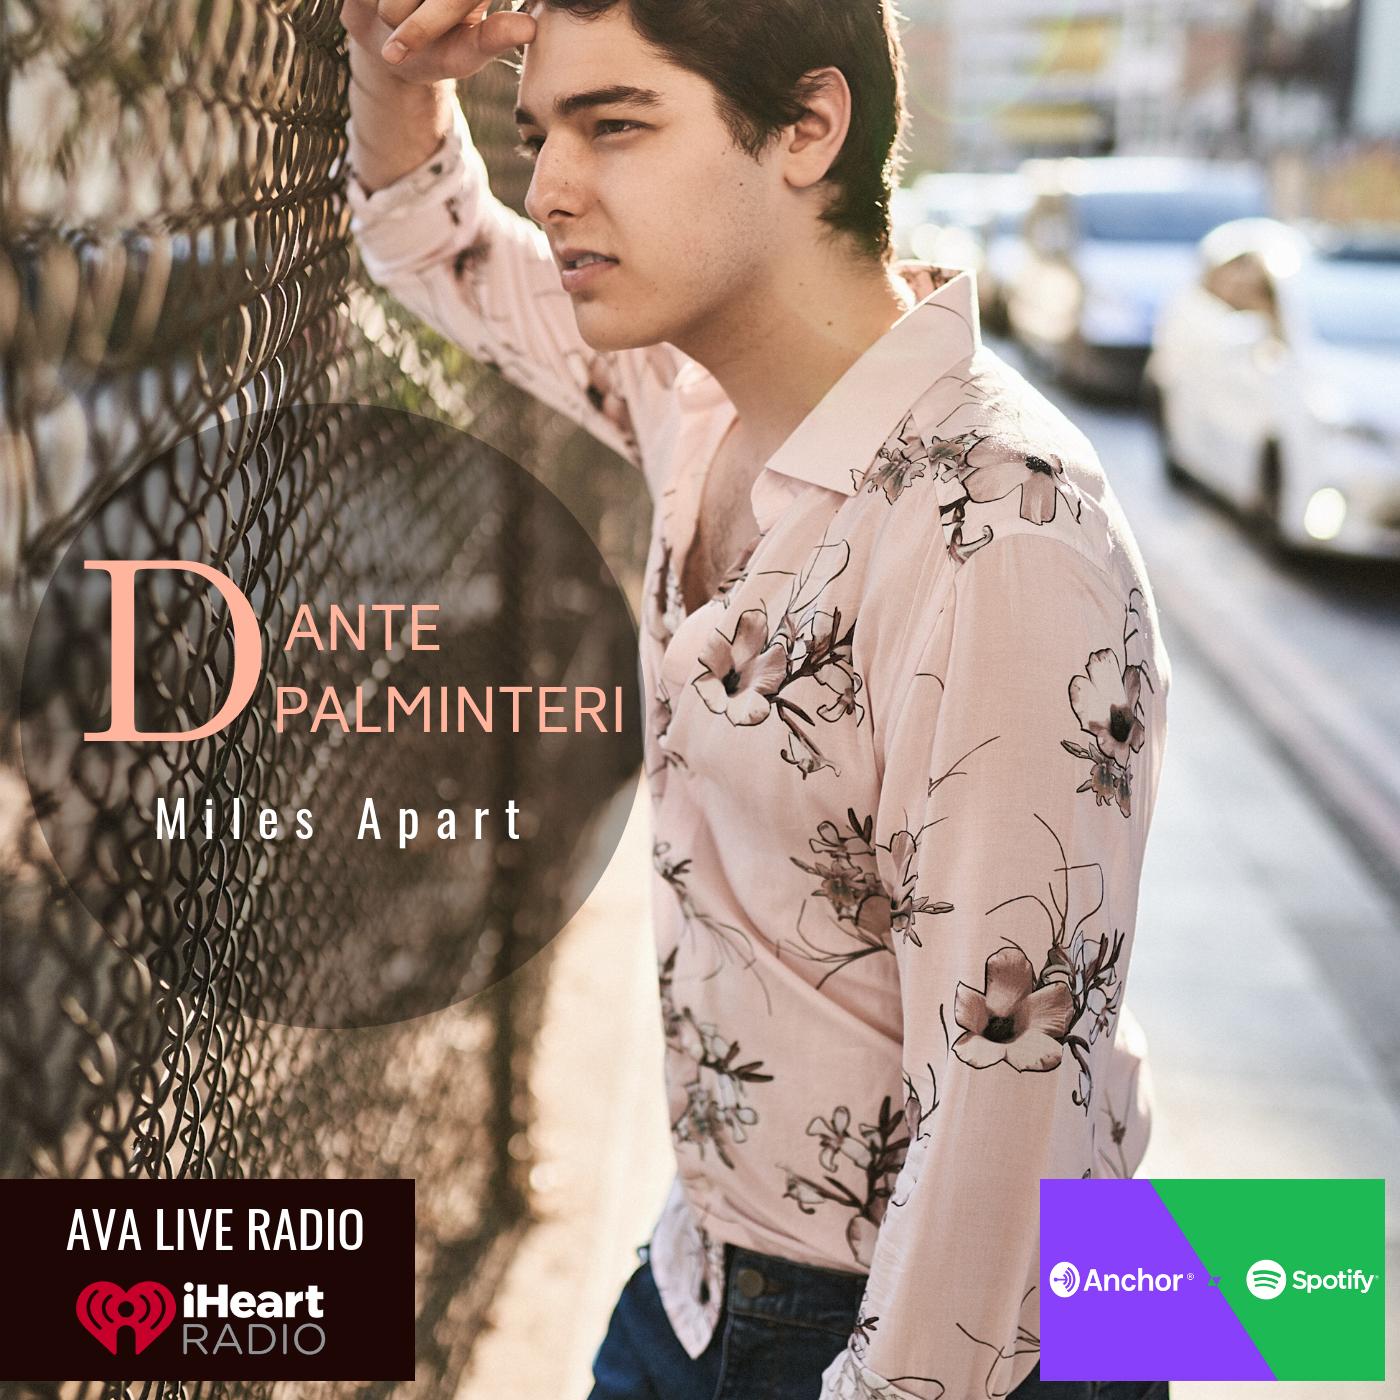 Miles Apart Dante Palminteri avaliveradio.png